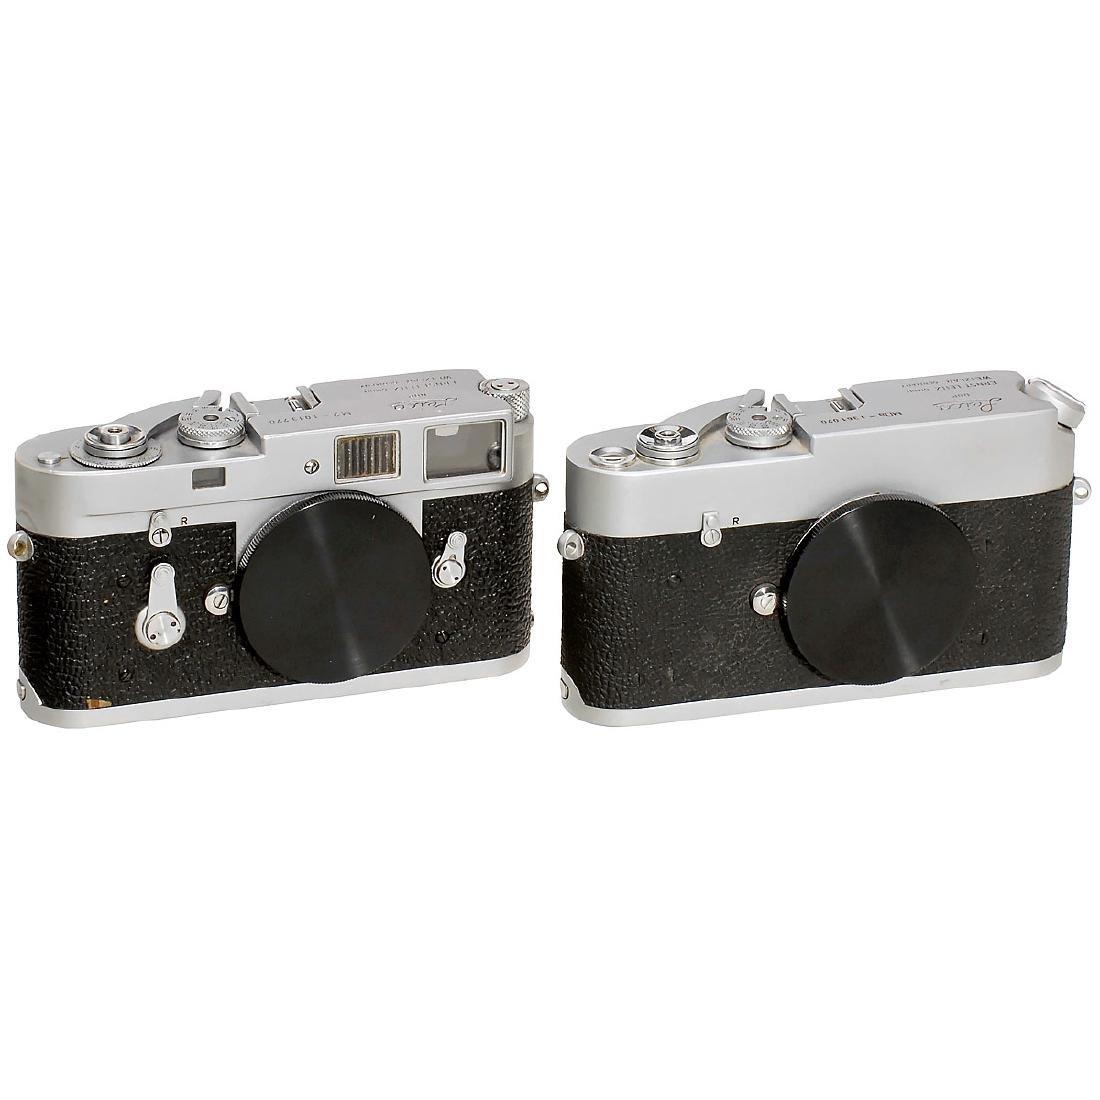 Leica M2 and MDa